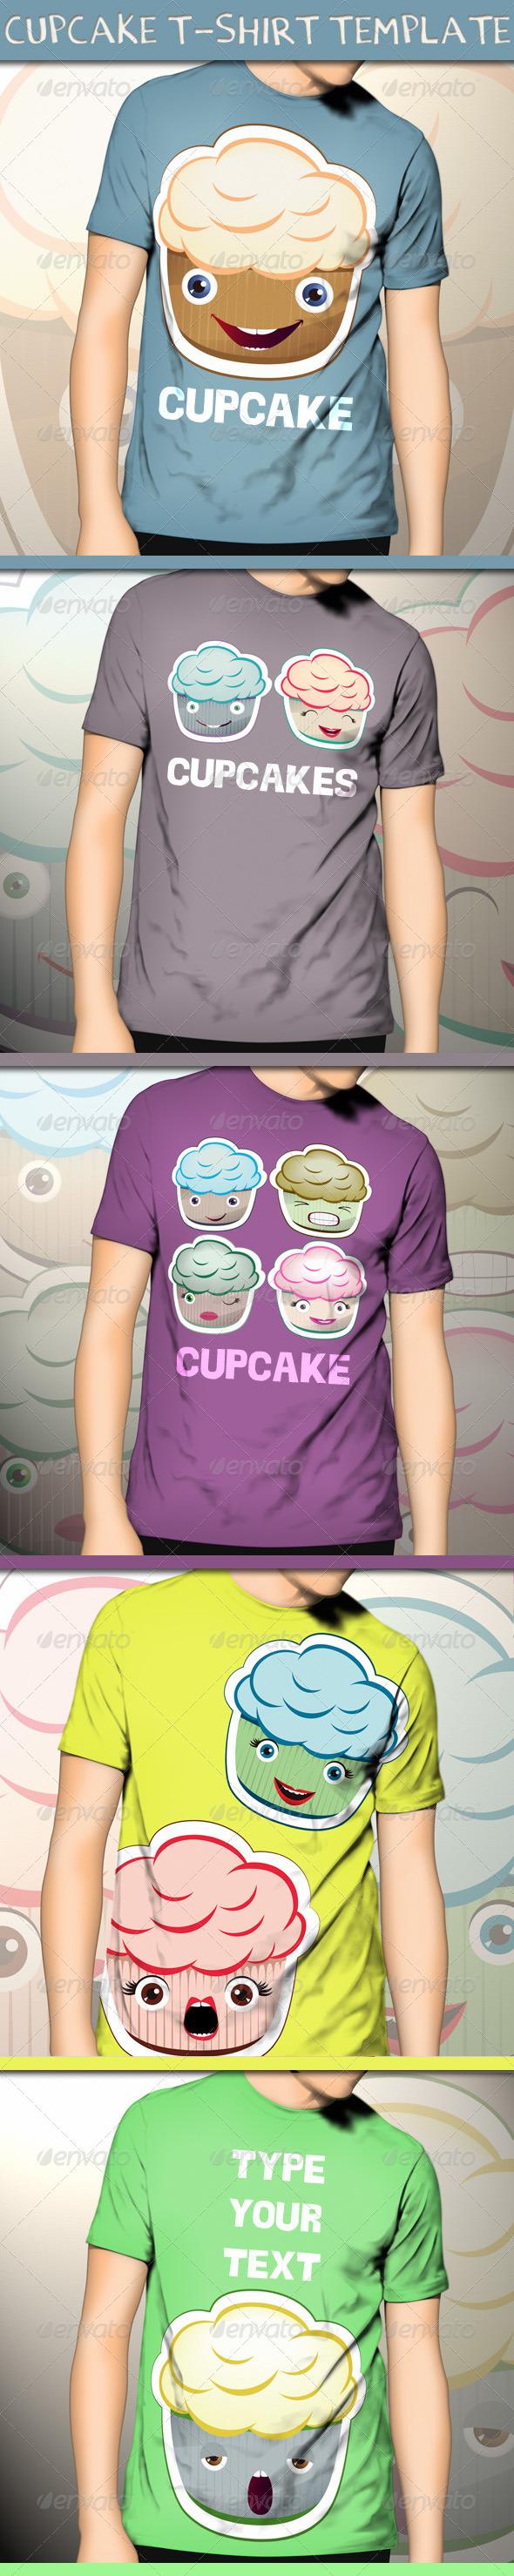 Cupcake T-Shirt Template